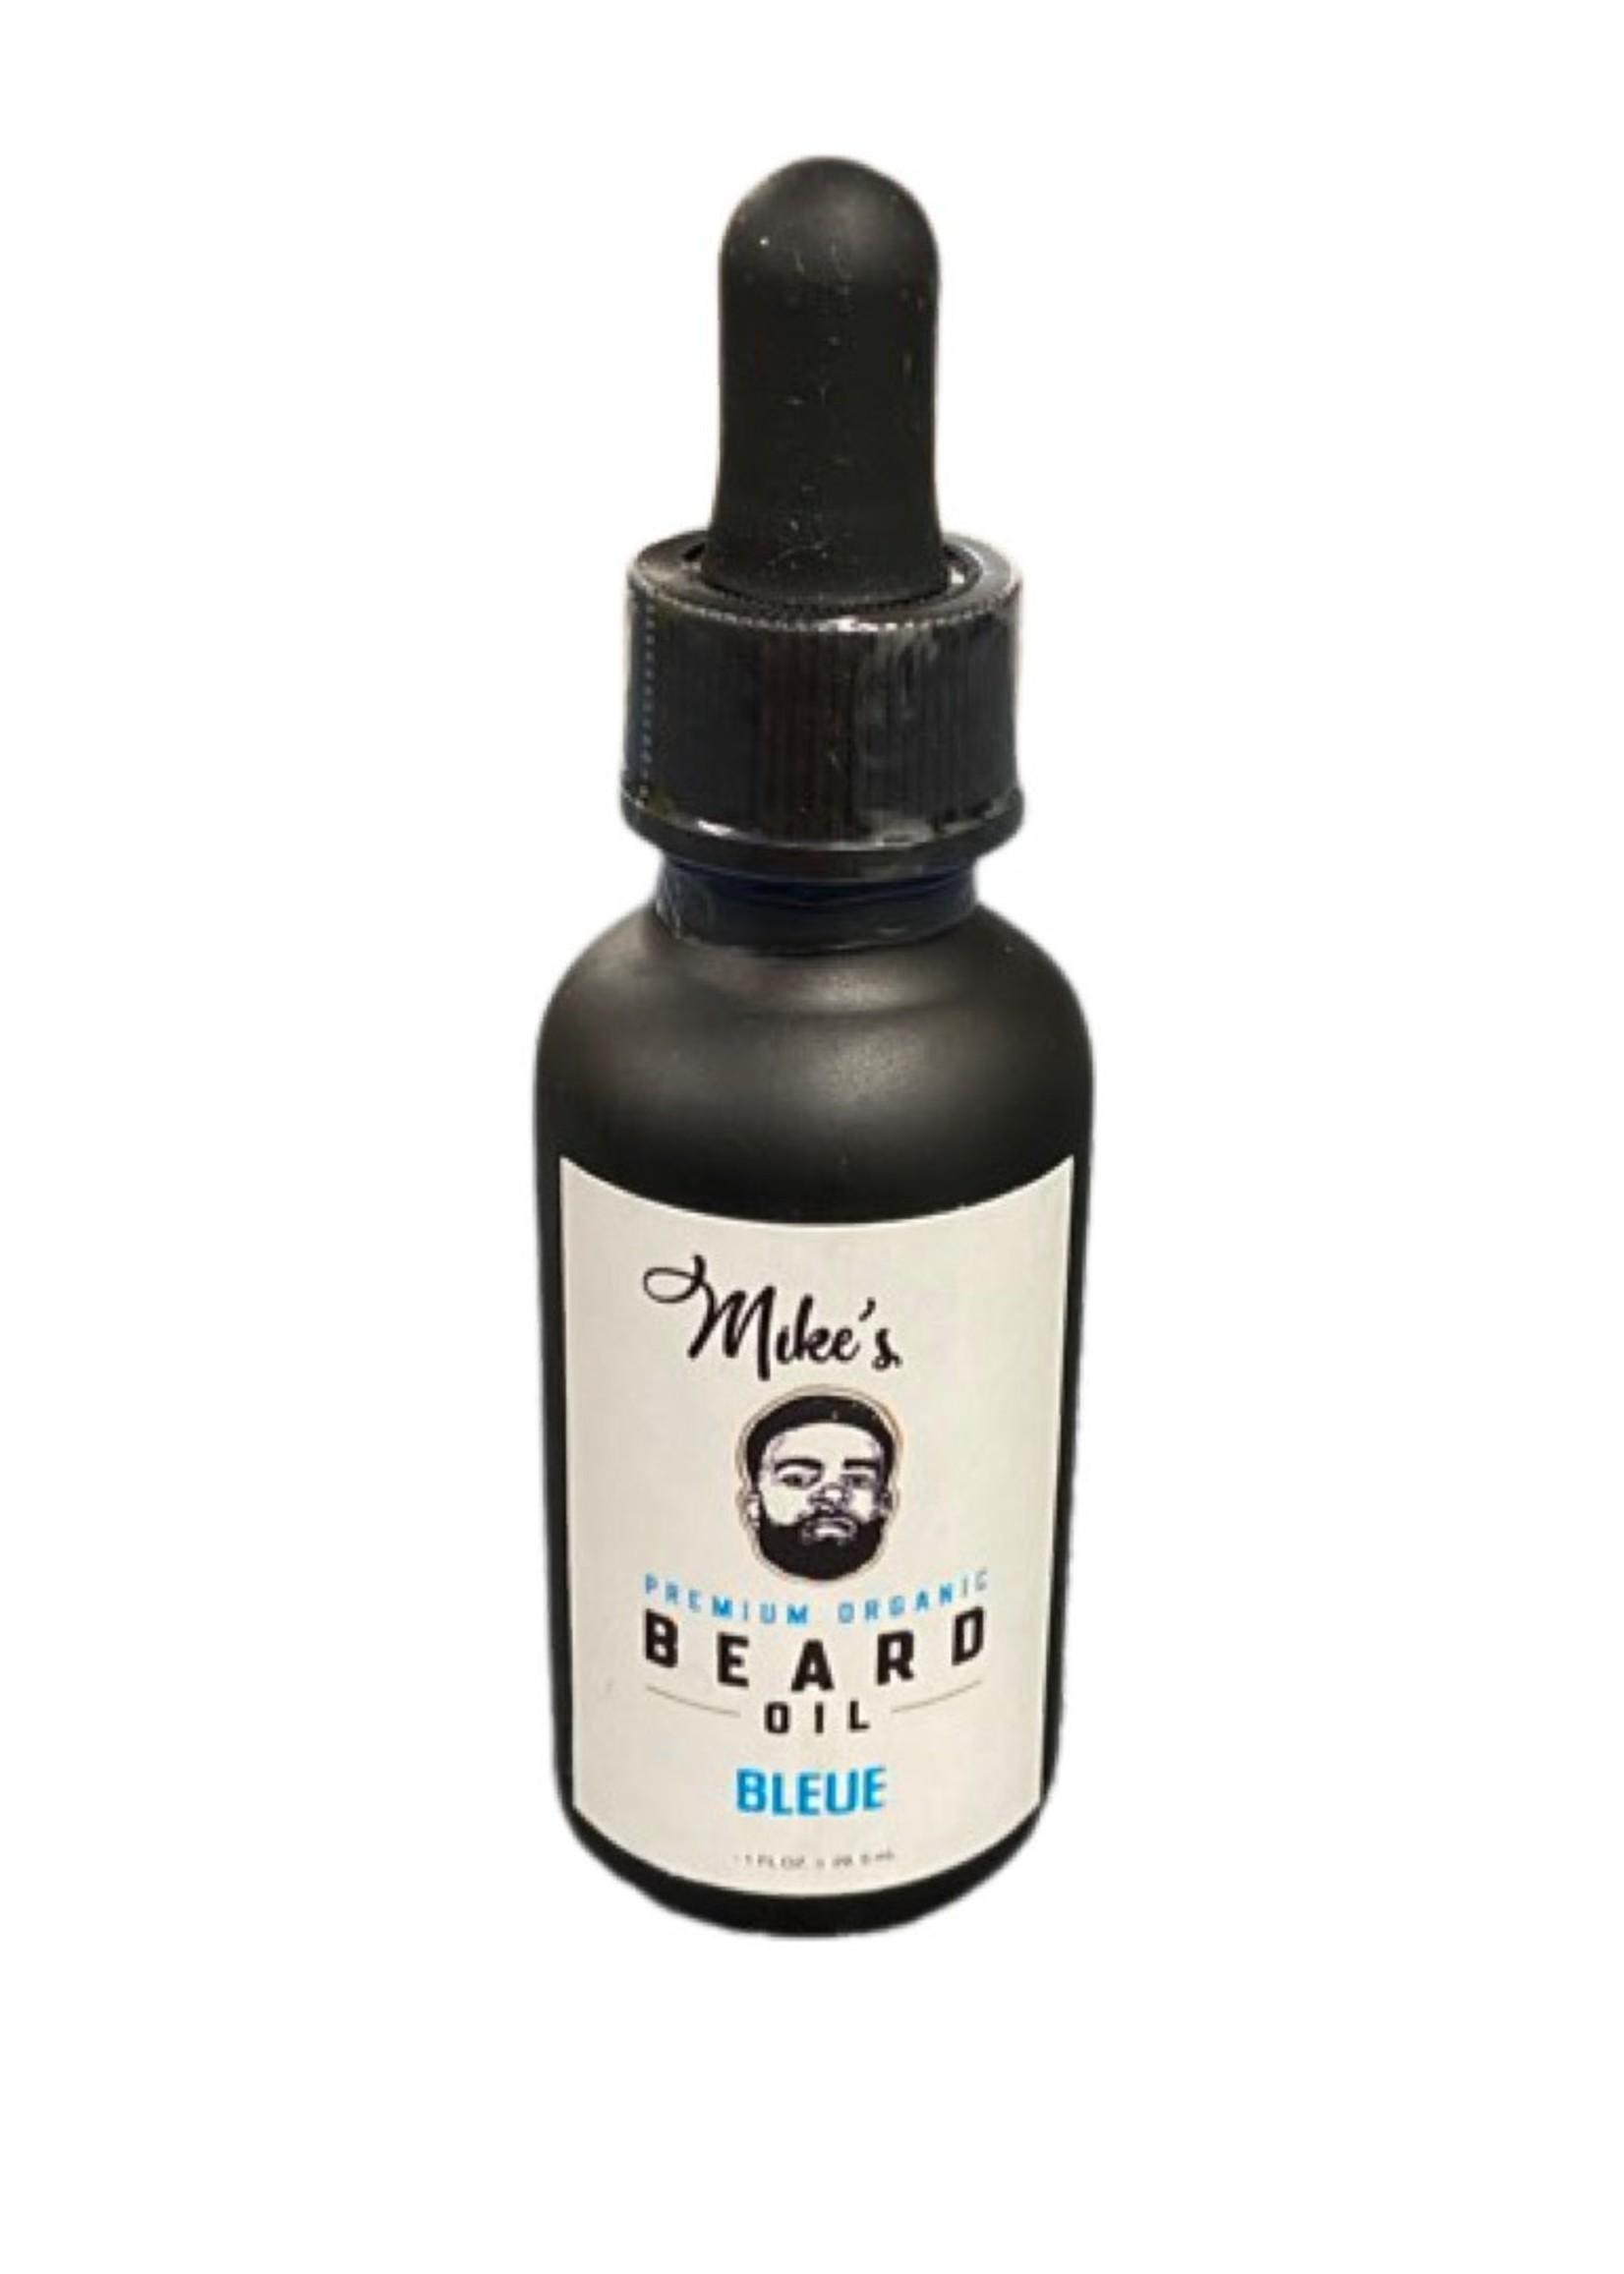 Mike's Premium Organic Beard Oil- Bleue